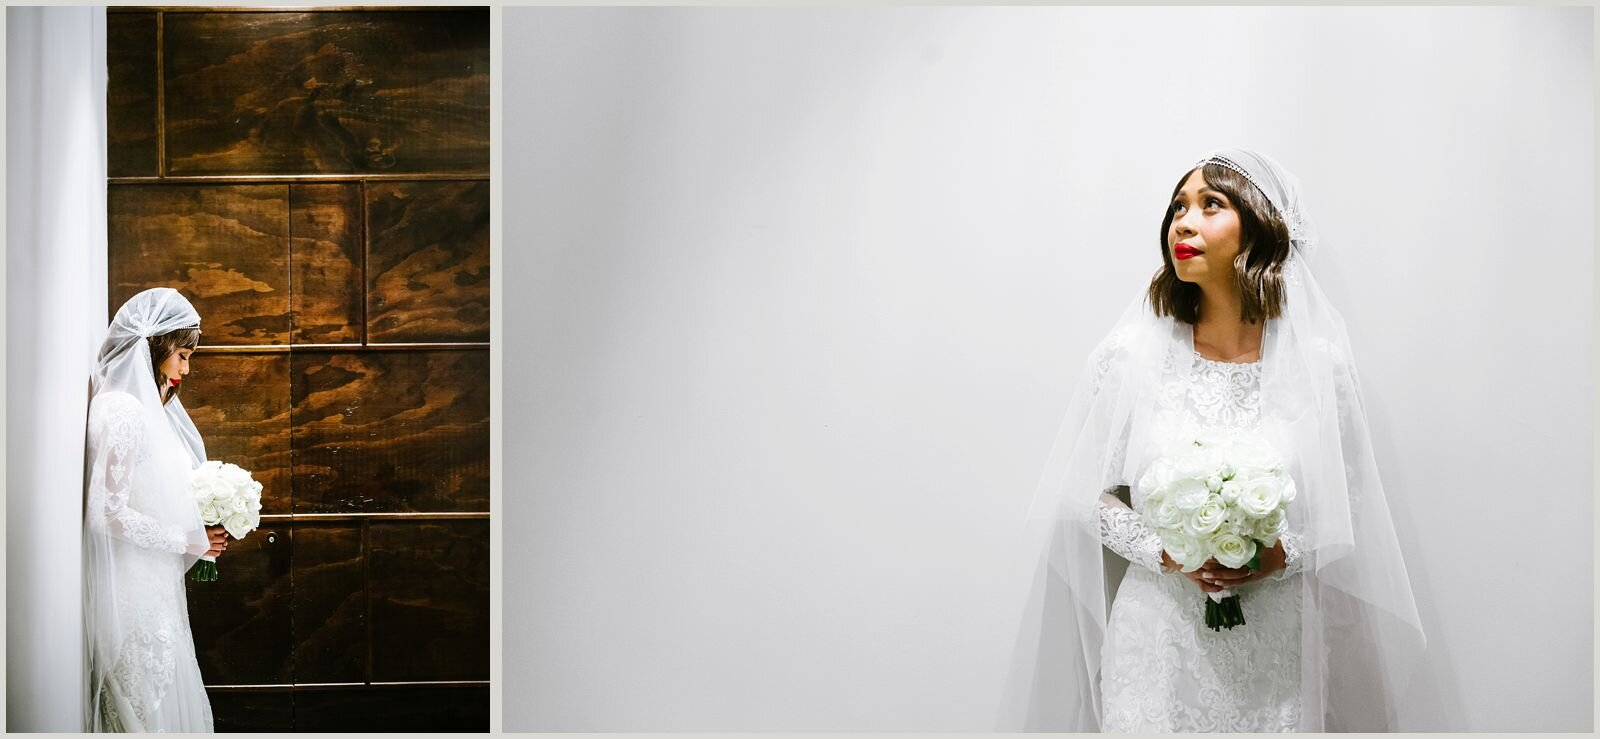 joseph_koprek_wedding_melbourne_the_prince_deck_0022.jpg